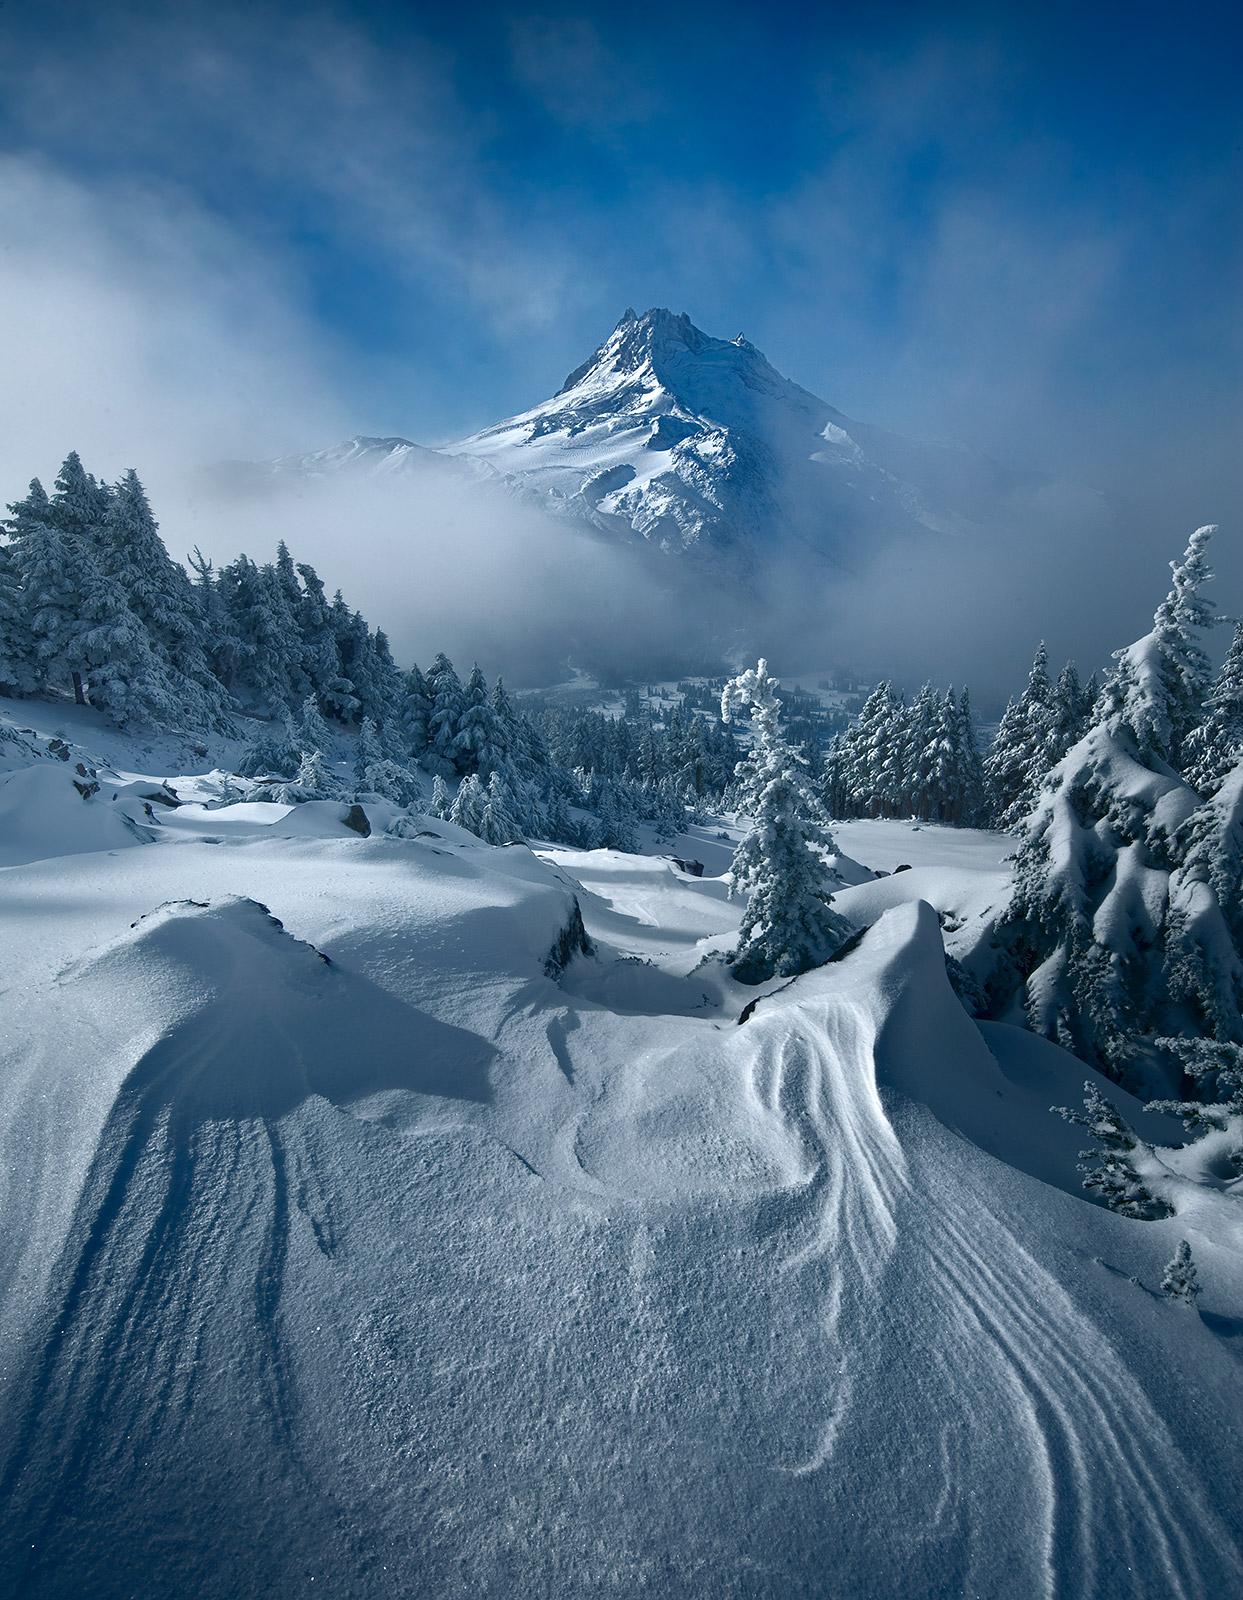 mount jefferson, clouds, morning, snowfall, alpine, photo